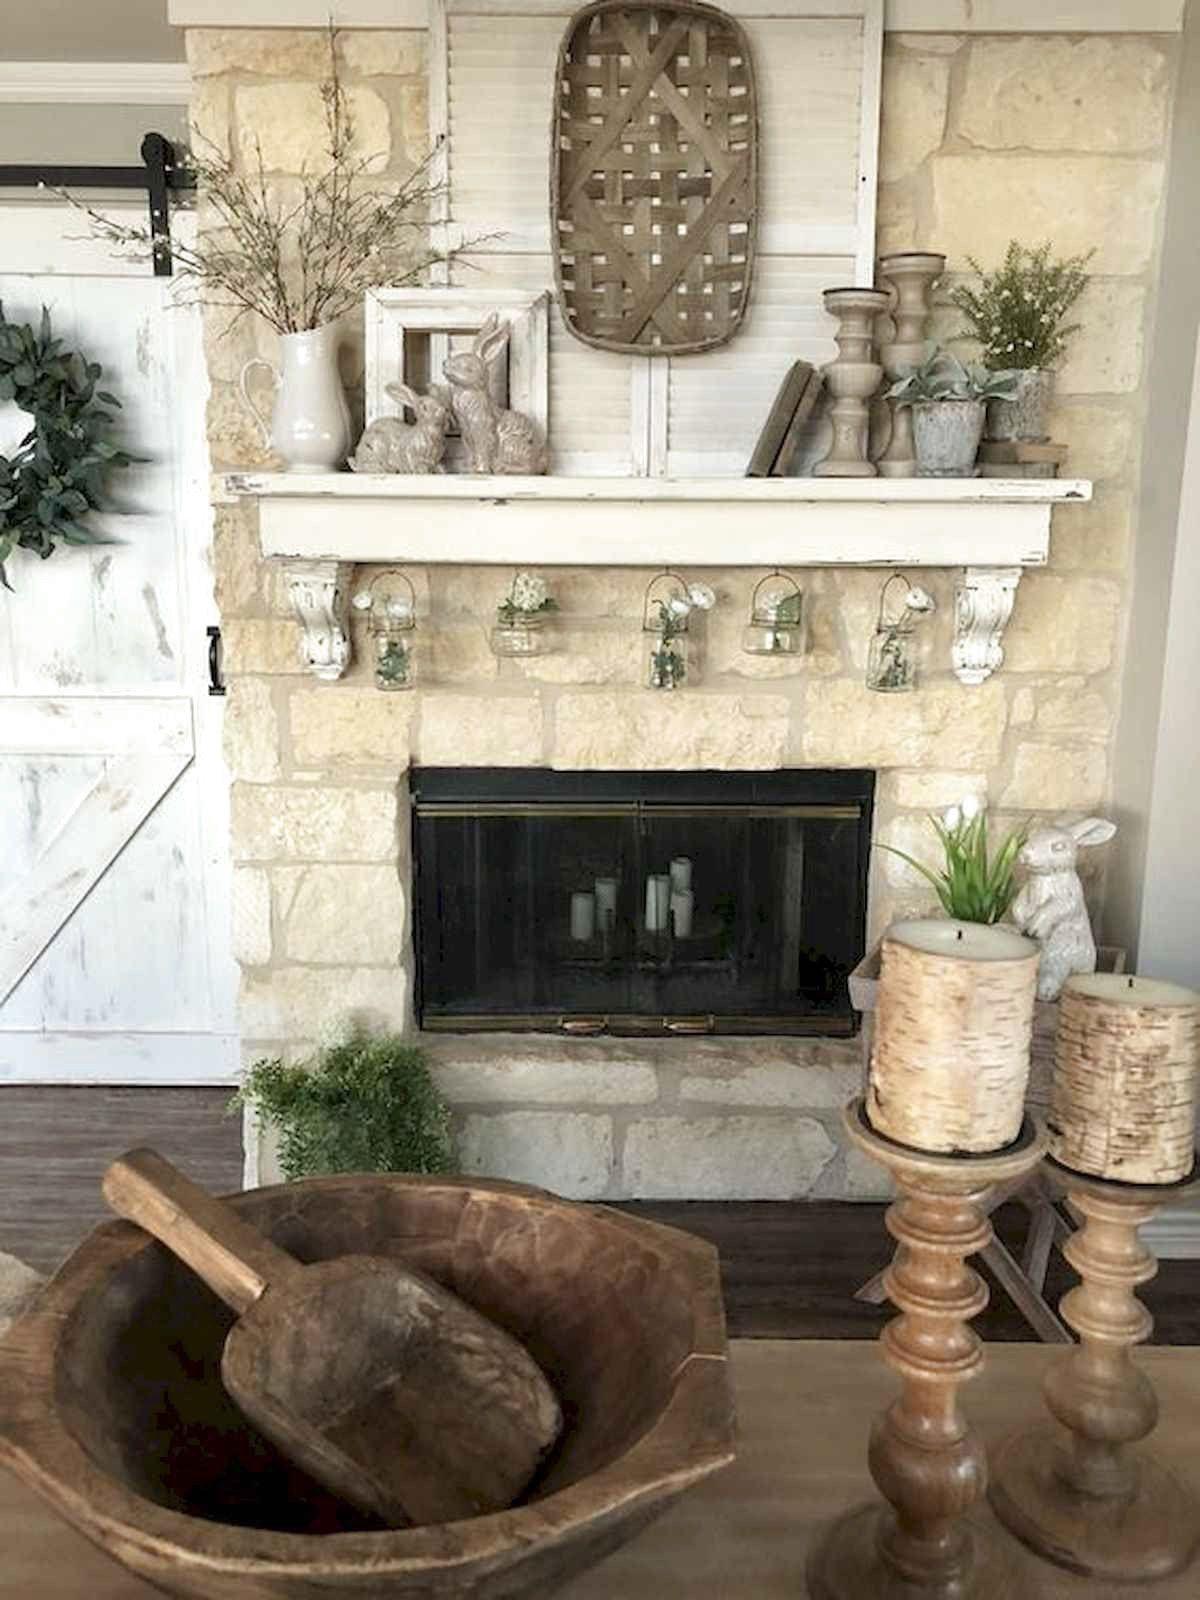 38 Best Modern Farmhouse Fireplace Mantel Decor Ideas Easter Fireplace Mantel Decor Easter Fireplace Mantel Fireplace Mantel Decor